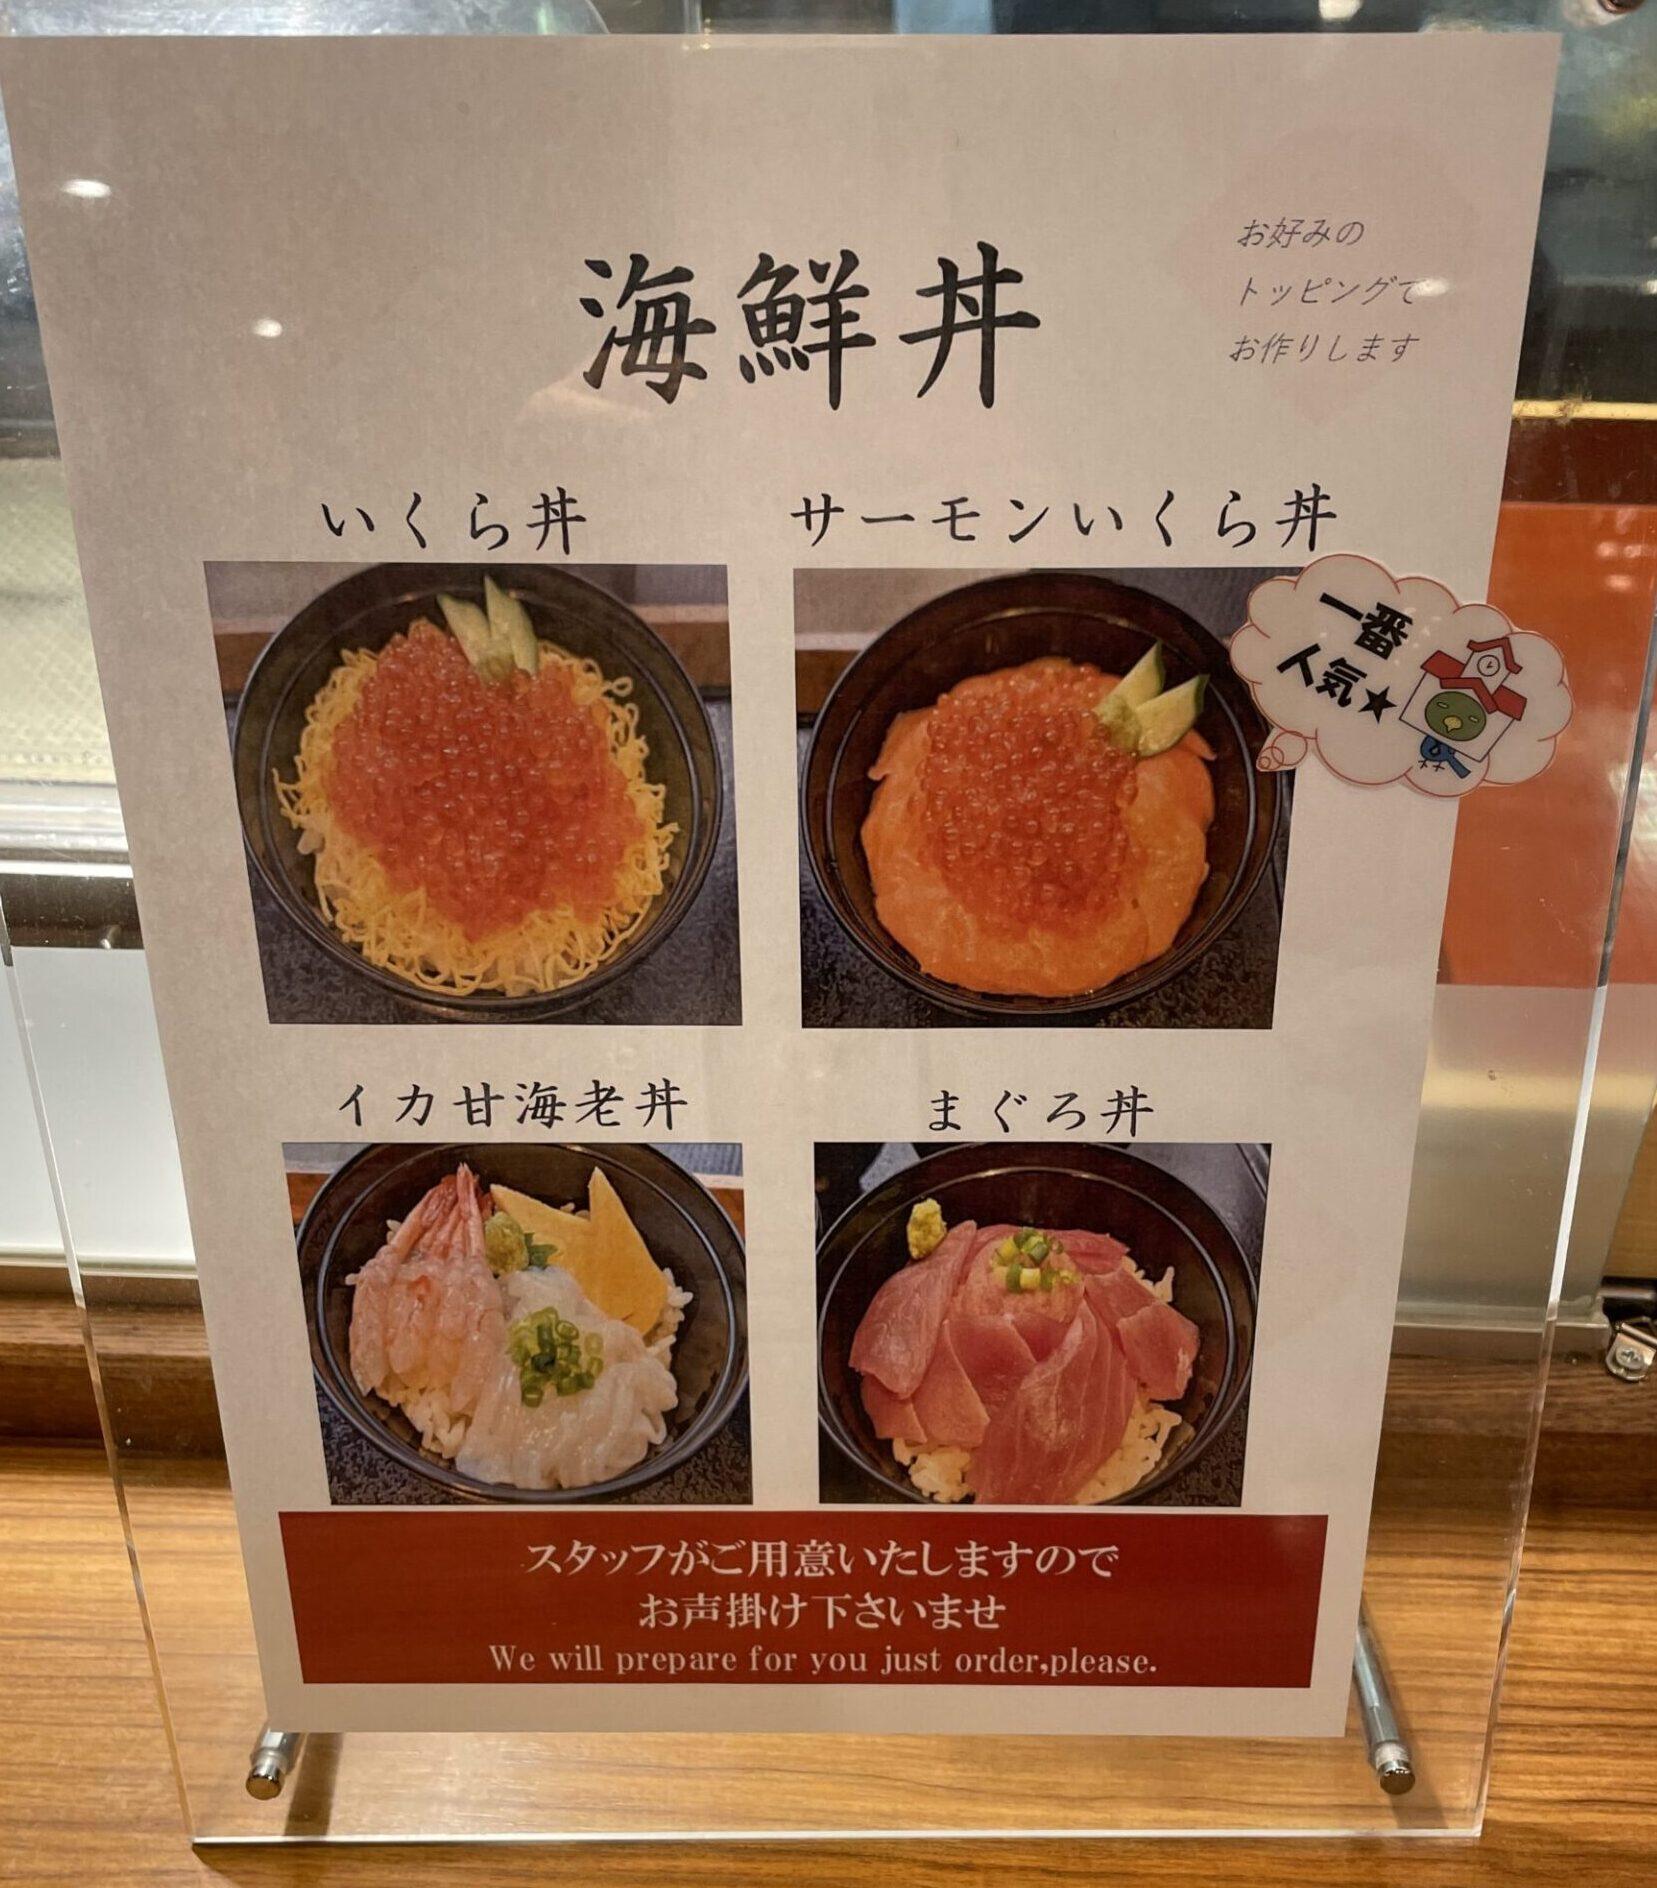 海鮮丼選び放題